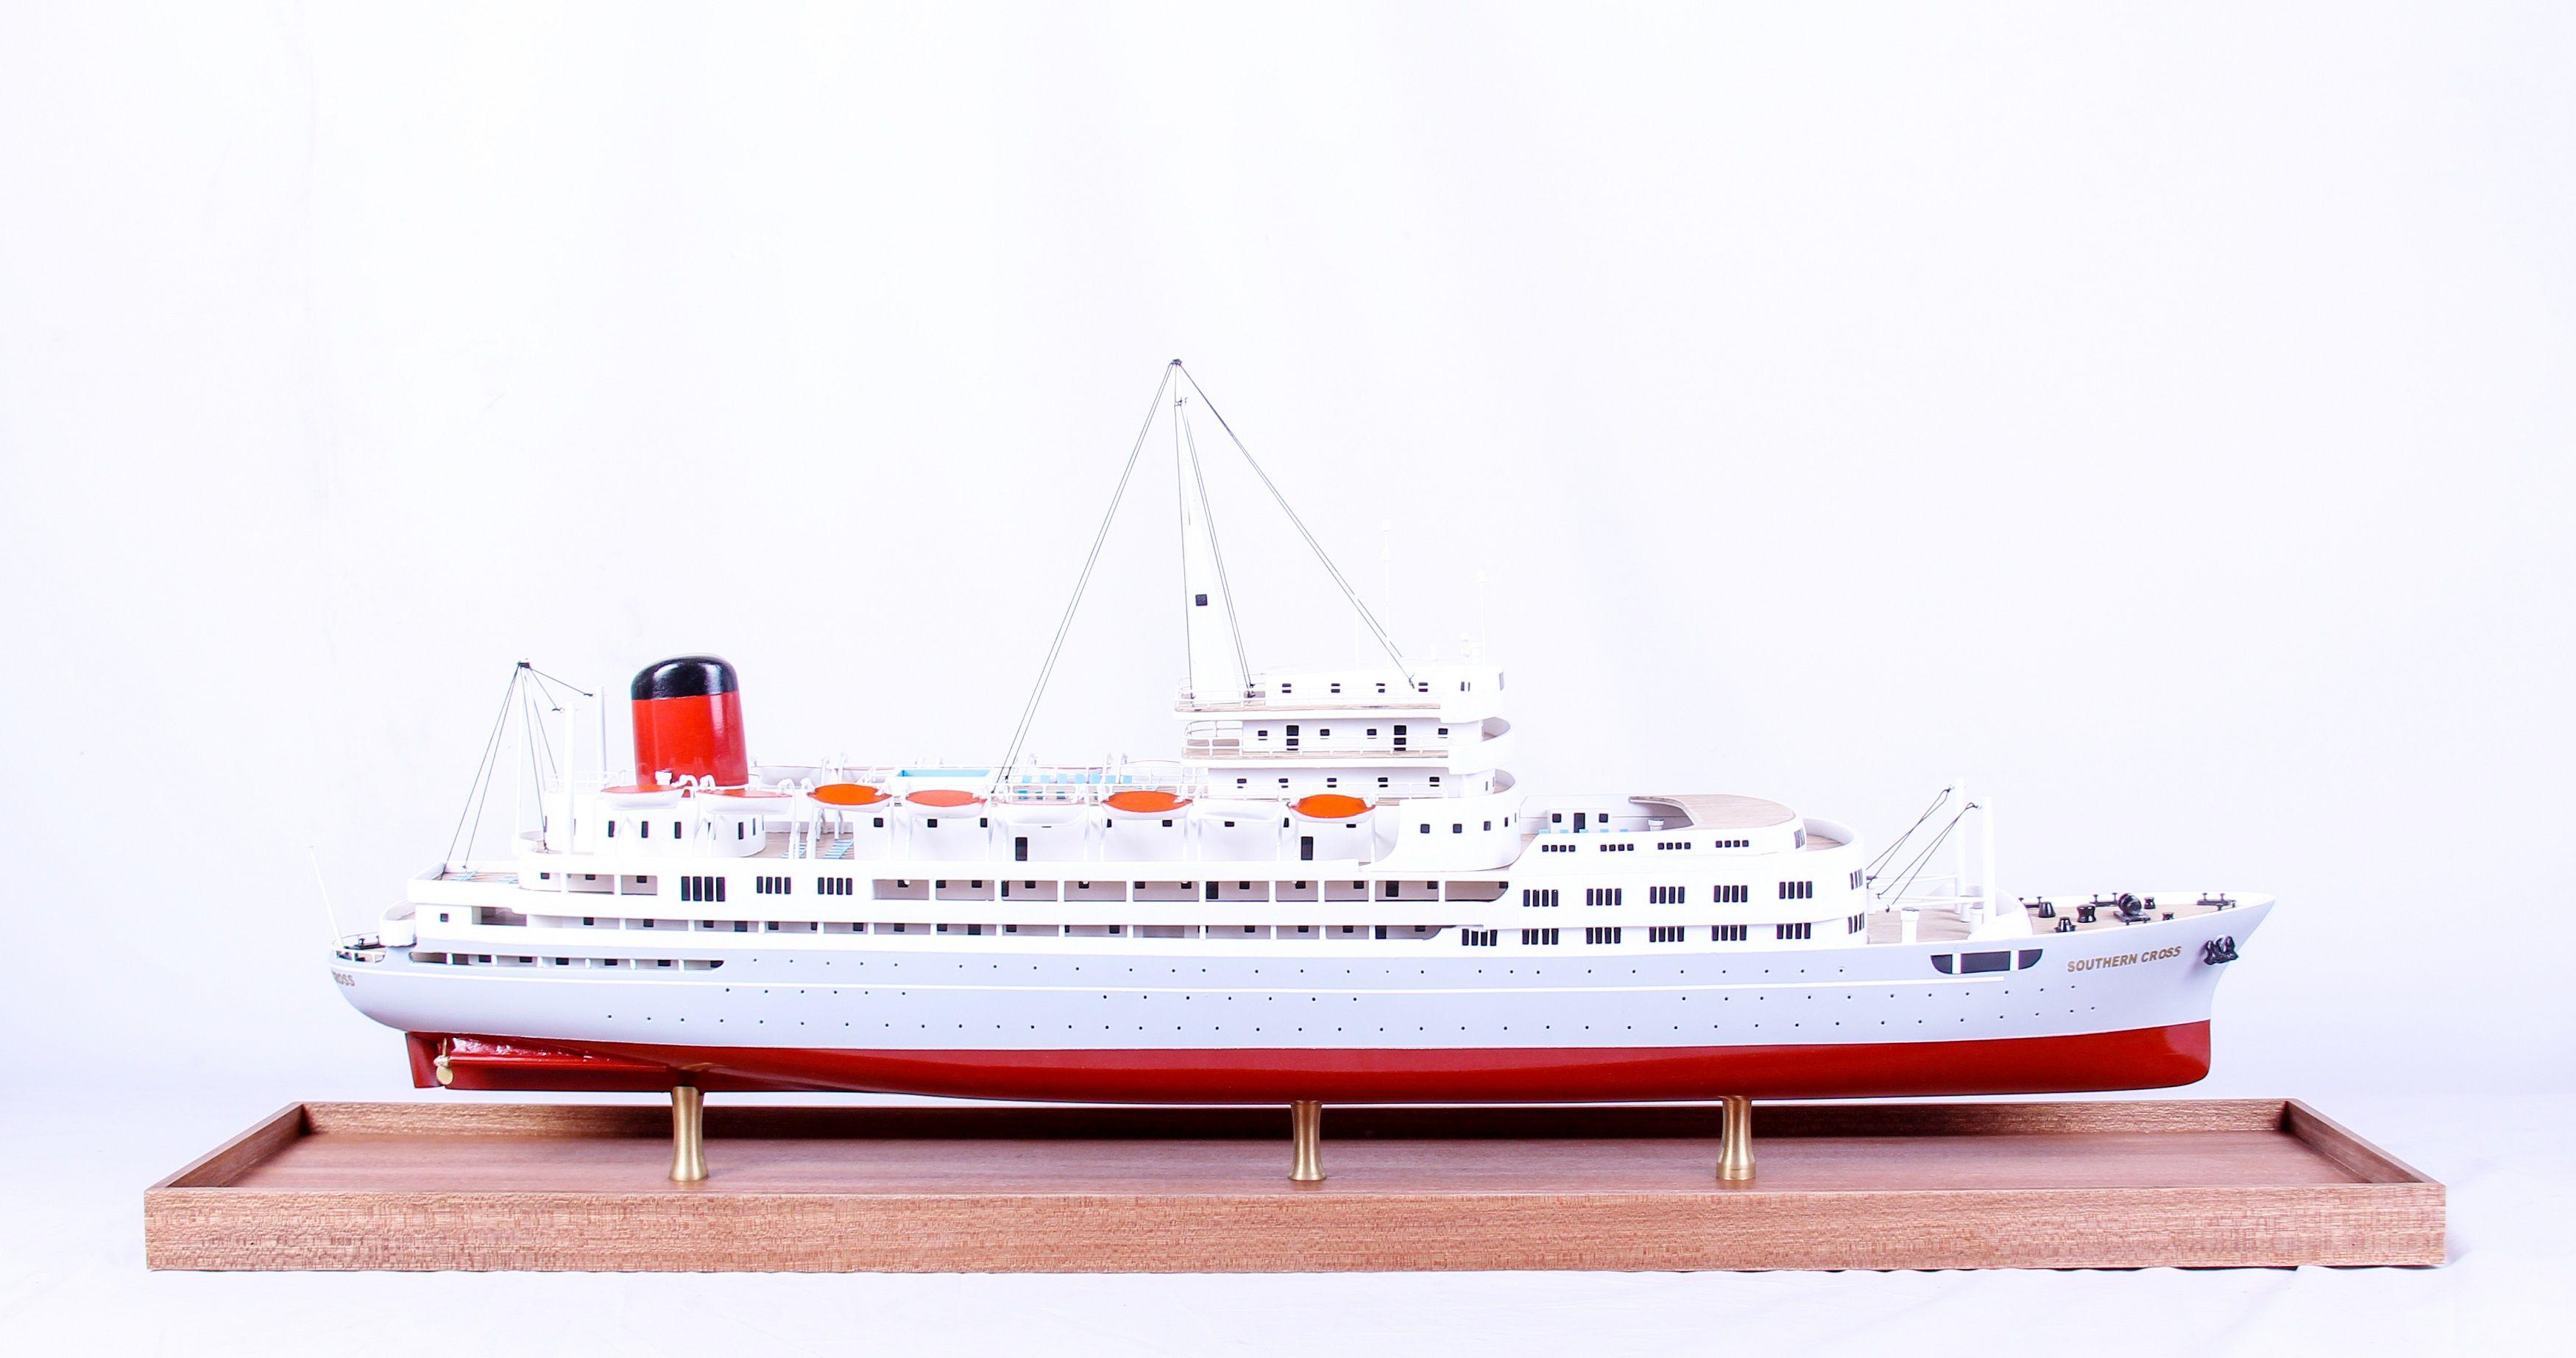 1691-9570-Southern-Cross-Passenger-Liner